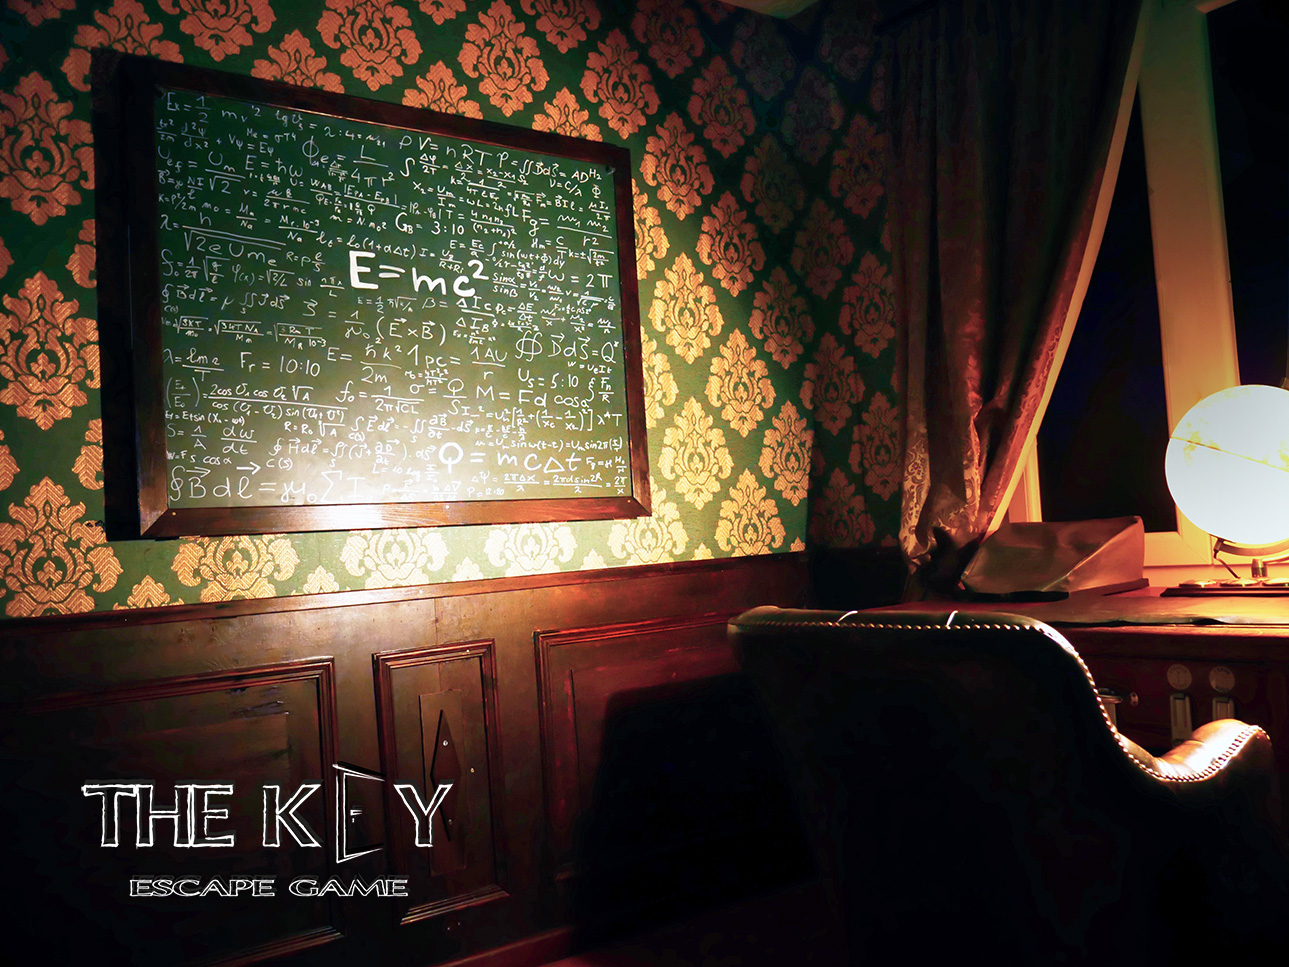 the key lausanne escape game avis promo. Black Bedroom Furniture Sets. Home Design Ideas